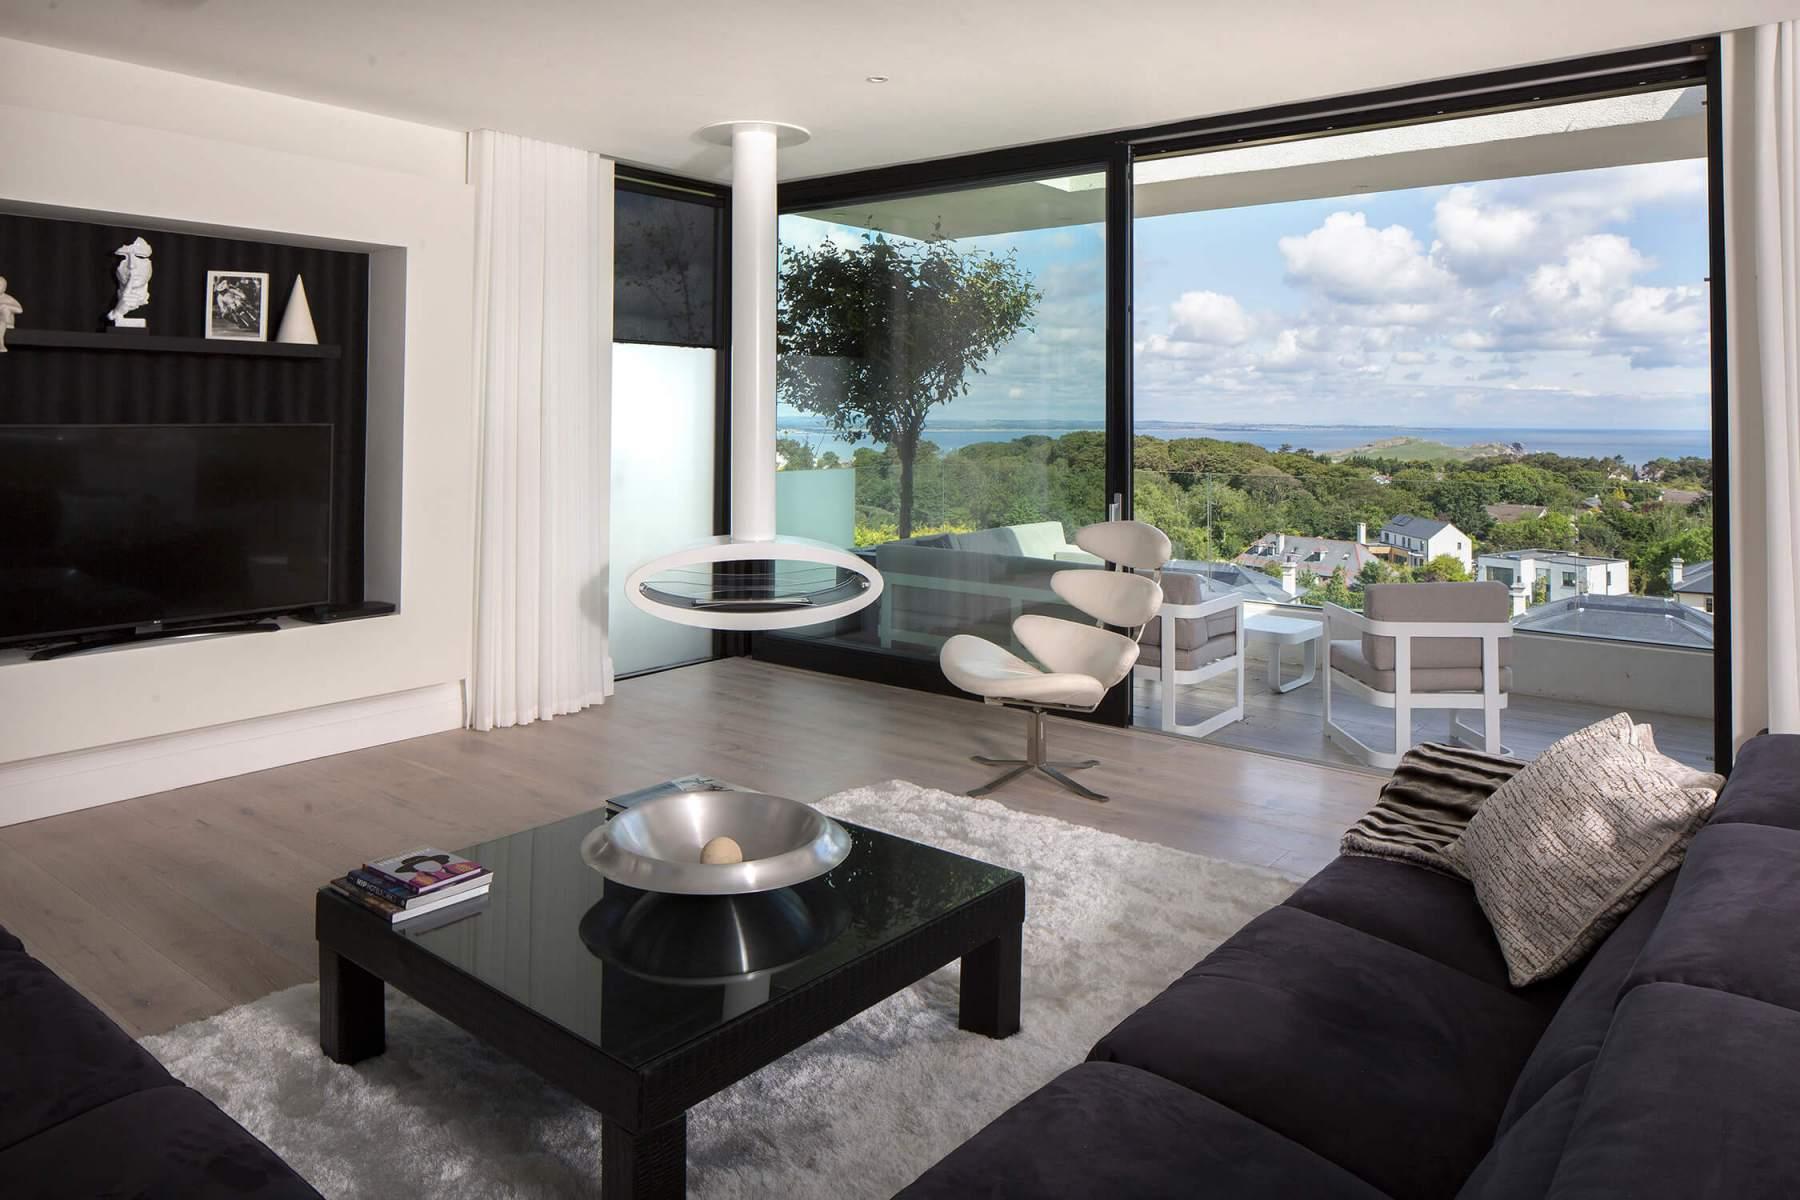 Interior-minimalist-view-dublin-bay